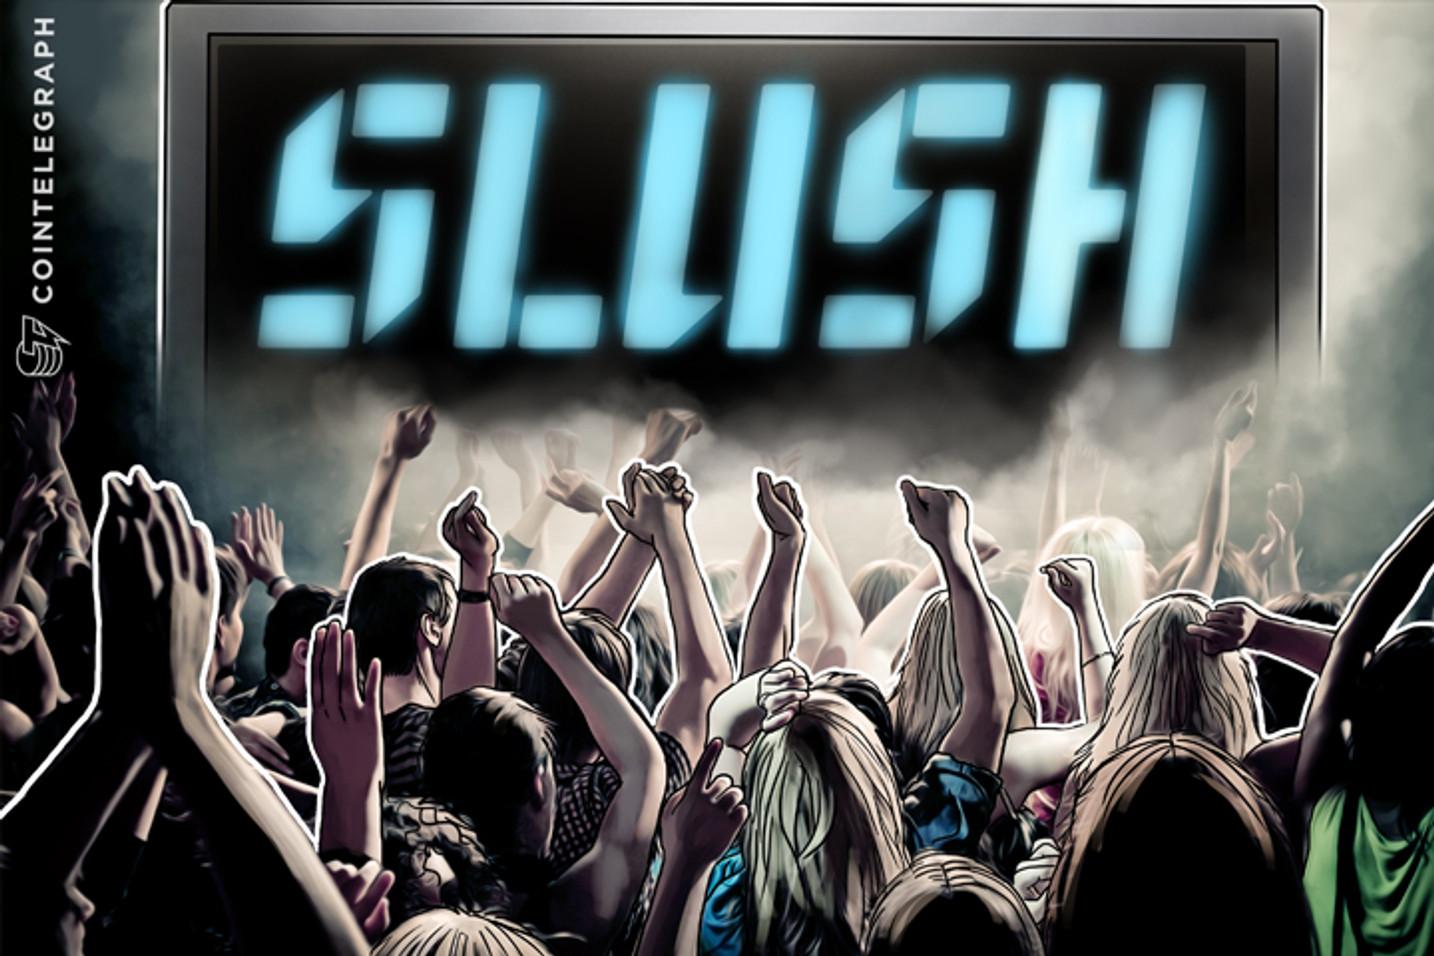 Bitcoin, Blockchains, FinTech Step into the Spotlight at SLUSH 2016 in Helsinki